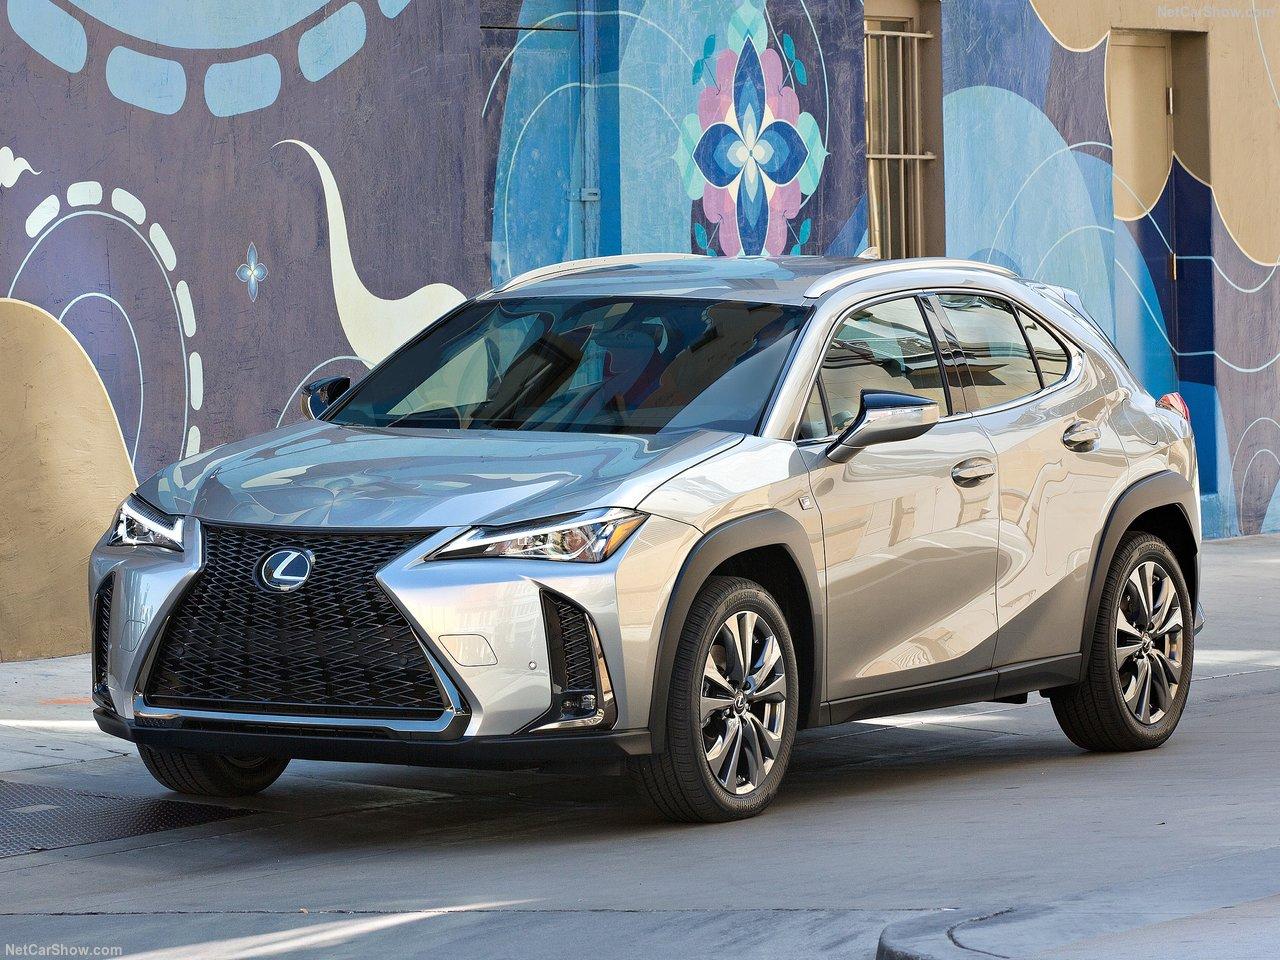 Lexus-UX-2019-1280-06_201808111144302a5.jpg